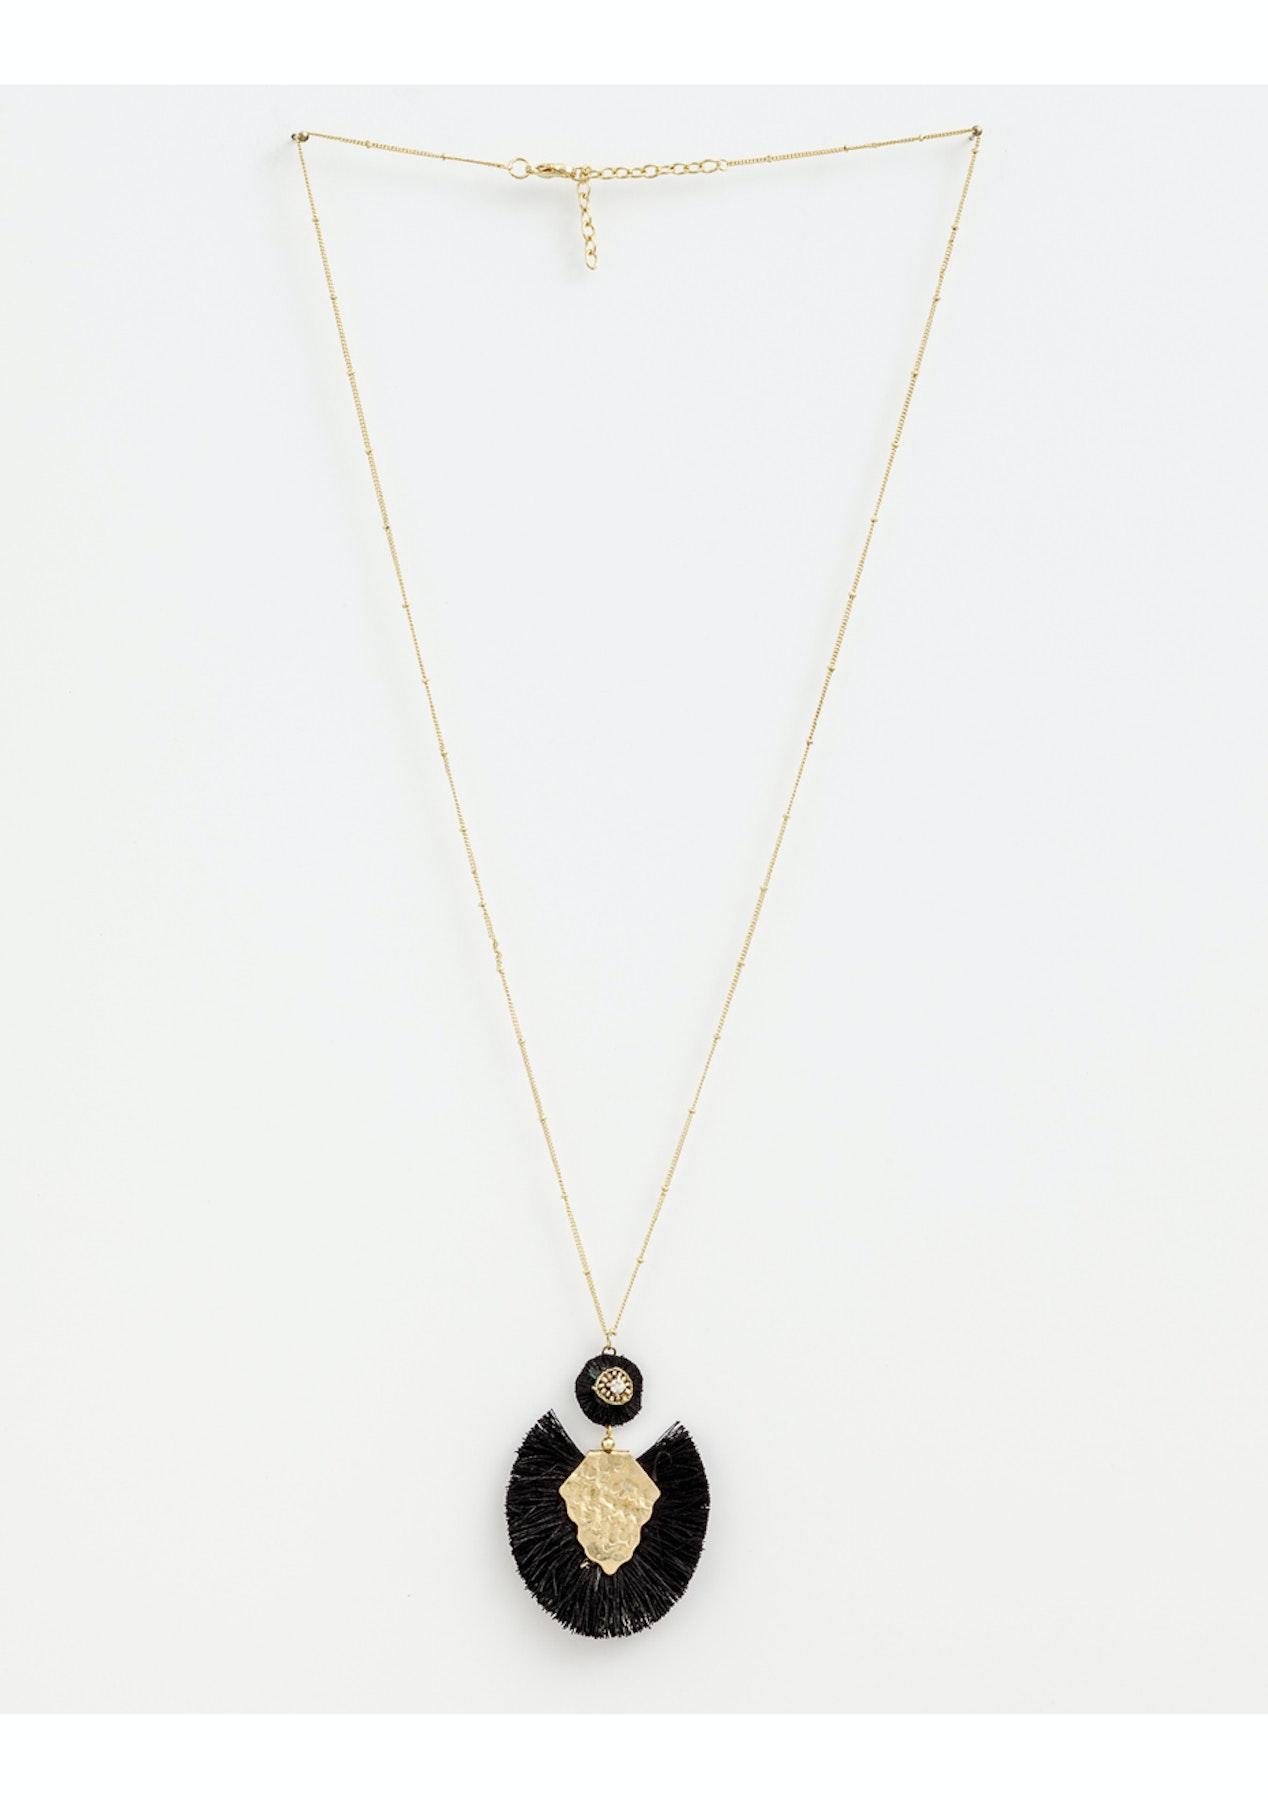 3fd43f1b3683 Stella + Gemma - Necklace Leather Fringe Black Gold - Boxing Day Stella +  Gemma Under  20 Sale! - Onceit